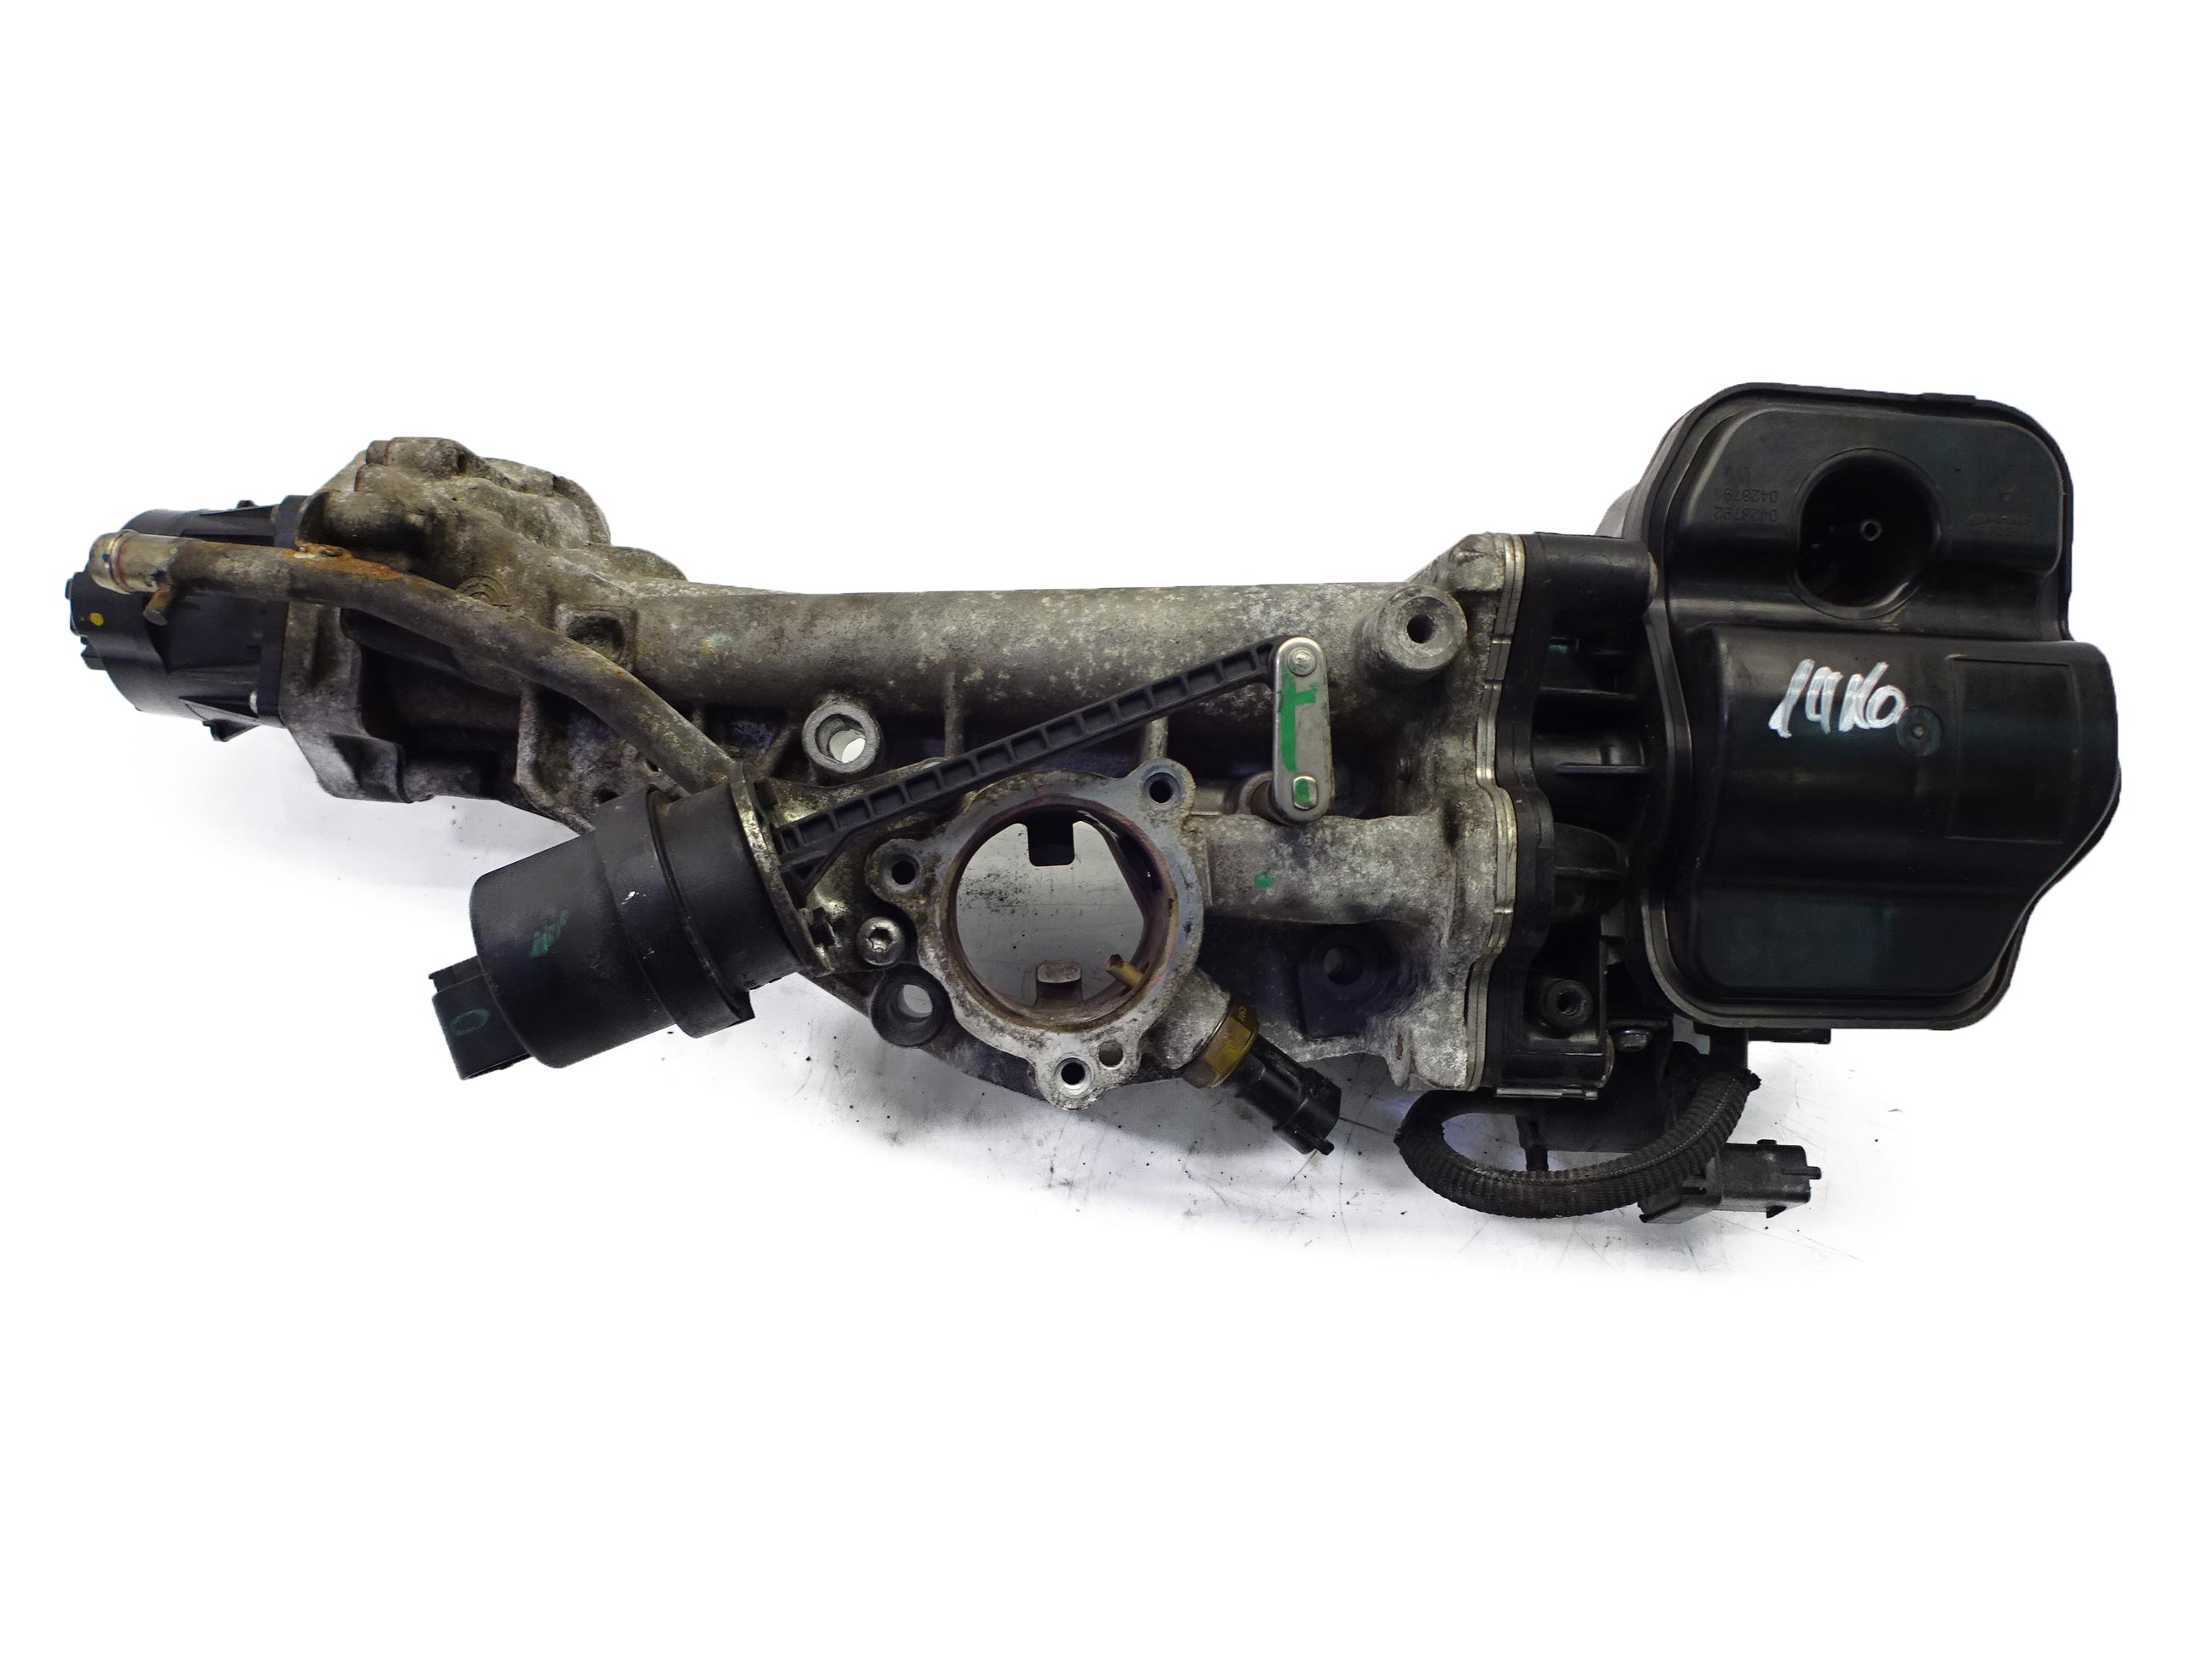 AGR Ventil Alfa Romeo Giulietta 940 2,0 JTDM Diesel 940A4000 55265385 0428762